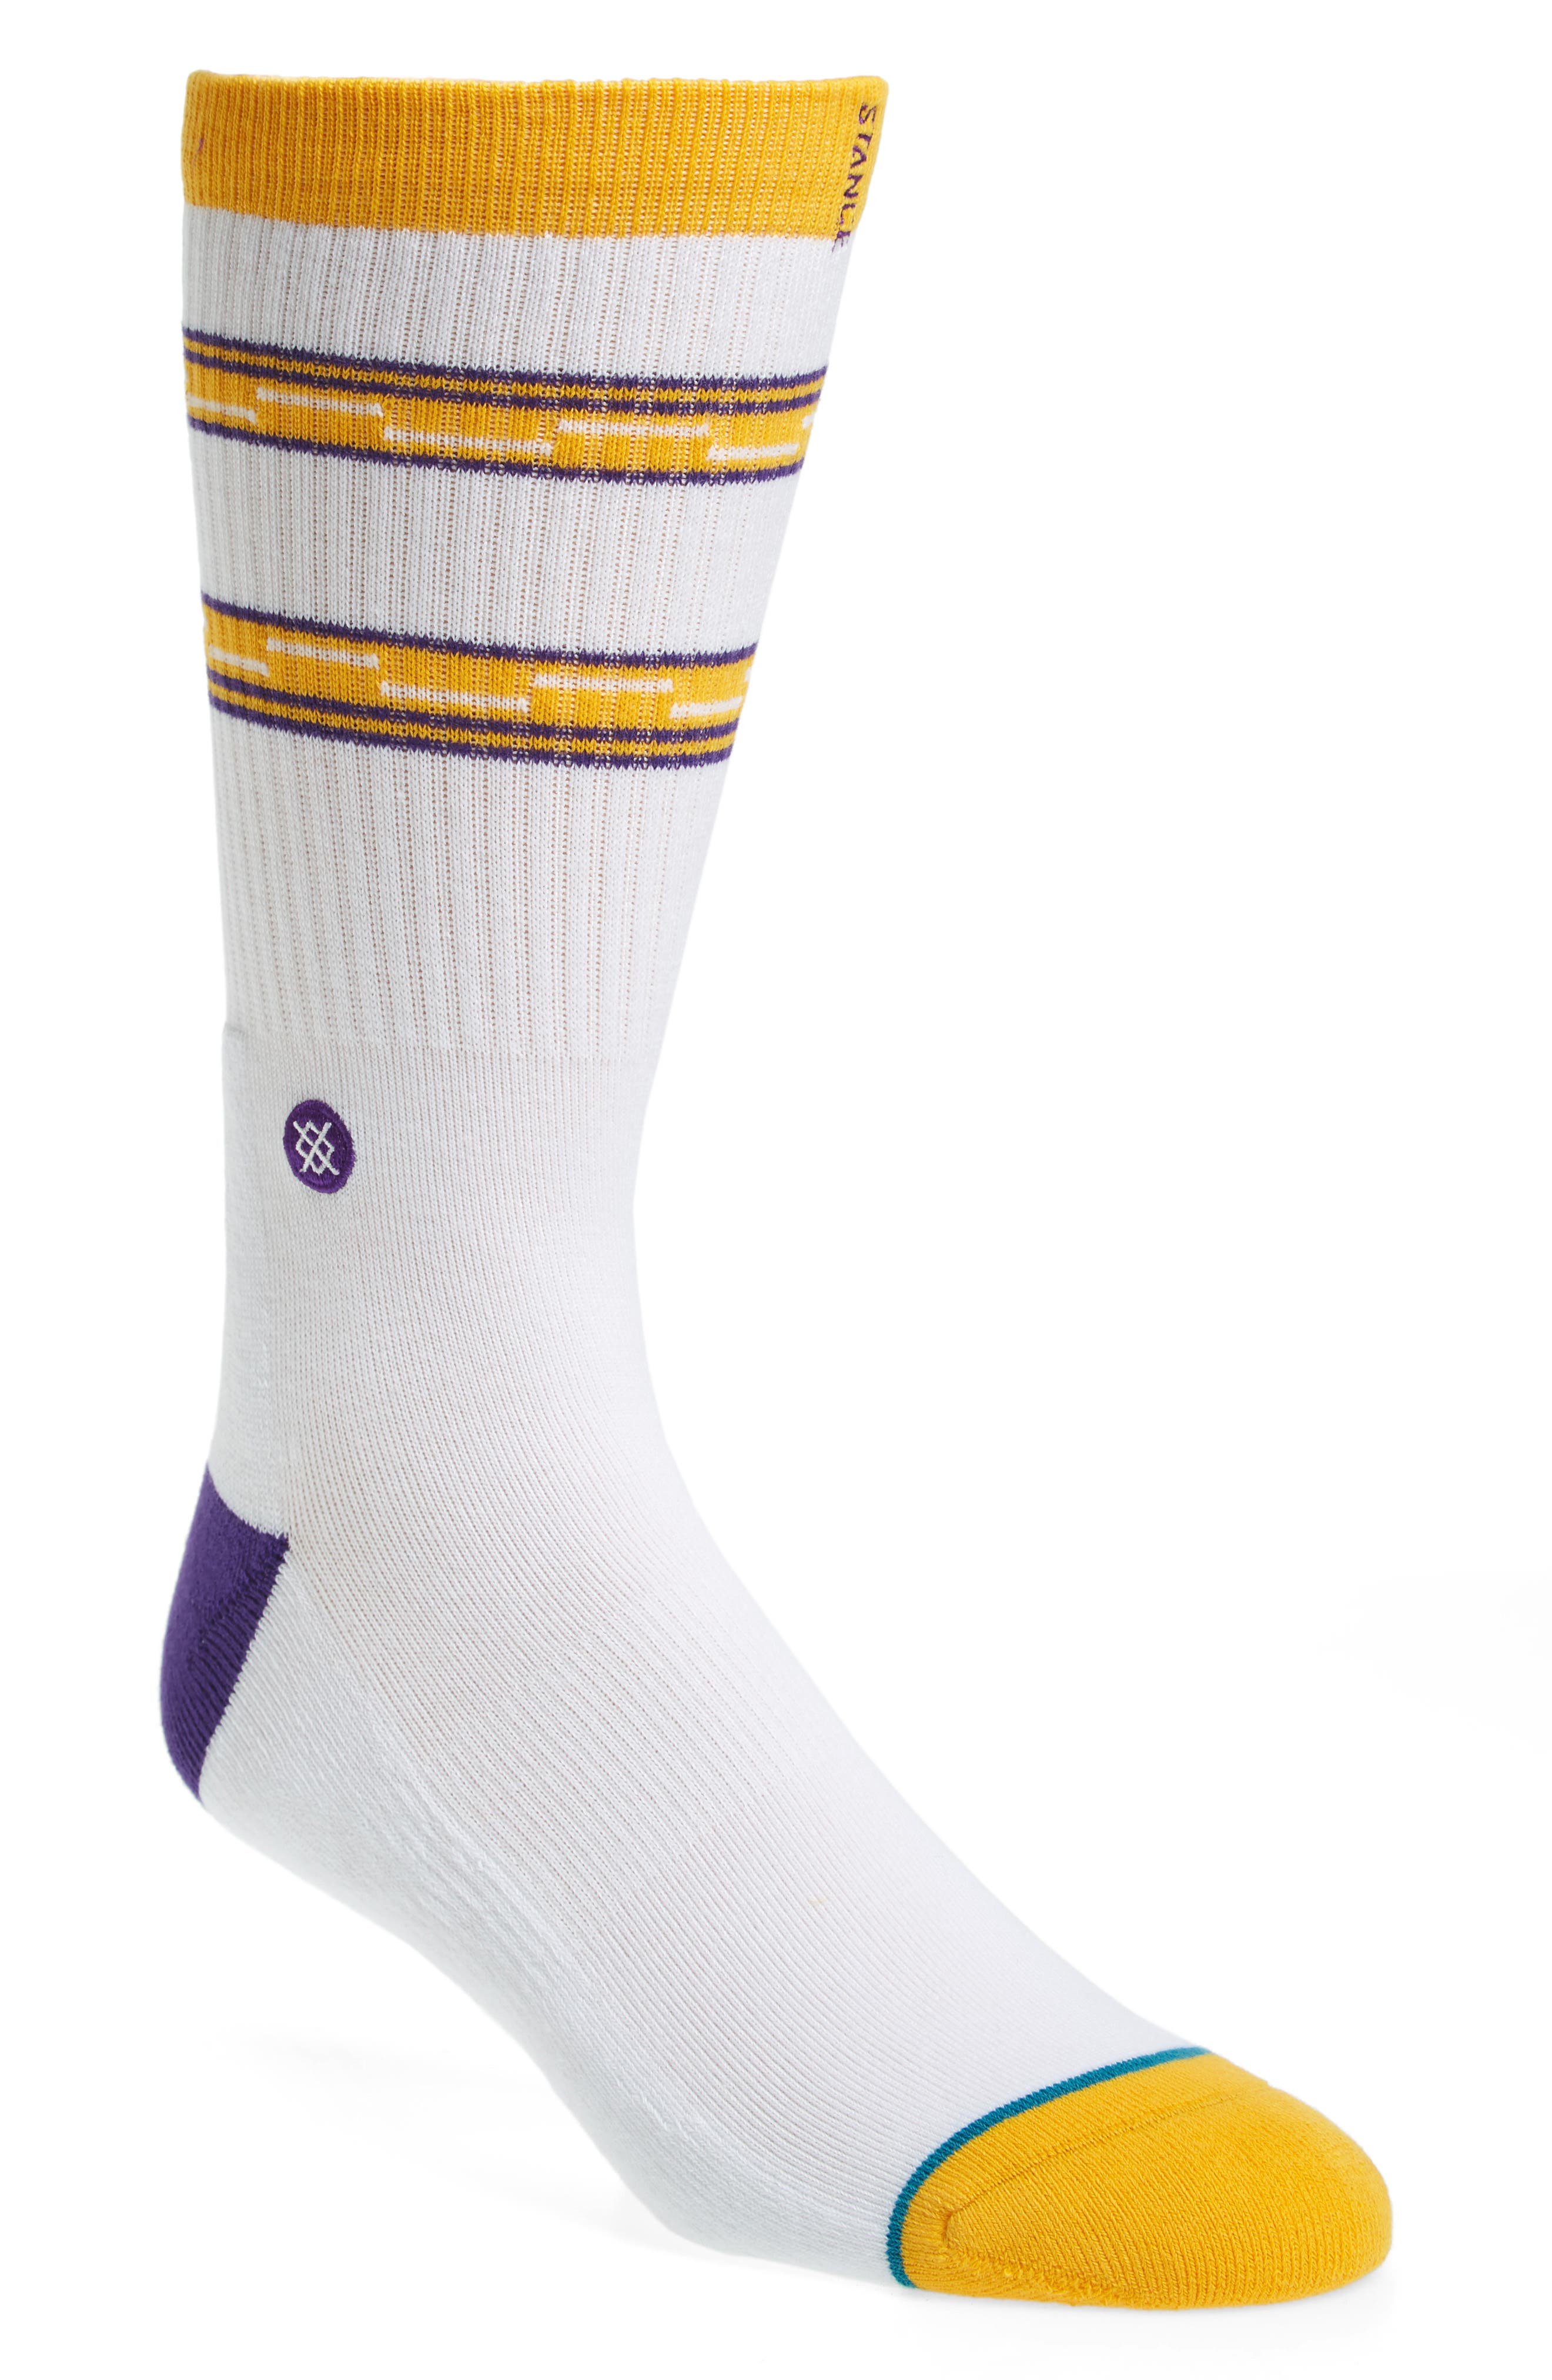 Los Angeles Lakers Arena Core Socks,                             Main thumbnail 1, color,                             100